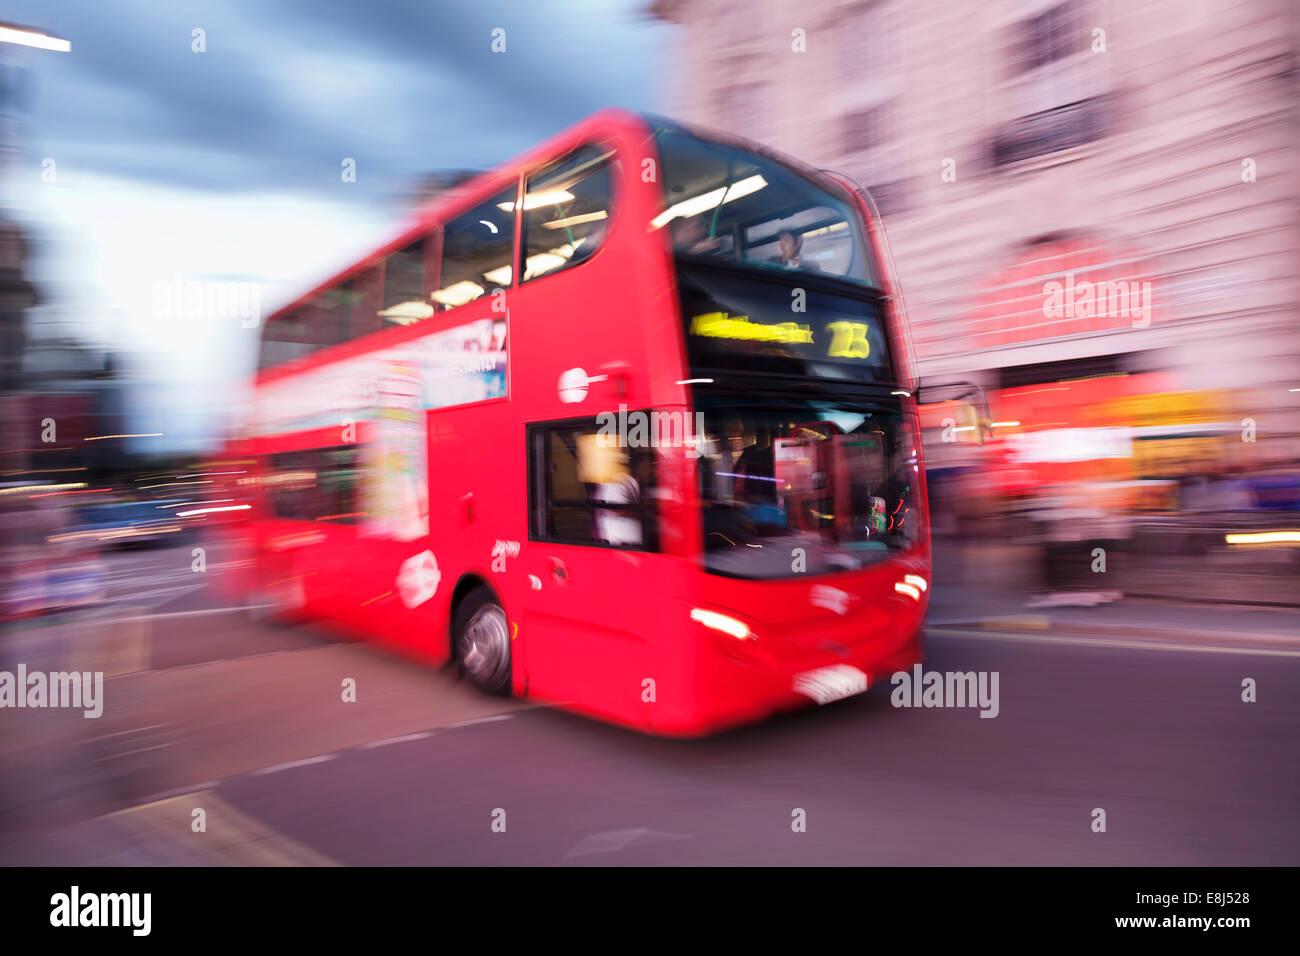 Roten Doppeldecker-Bus, Bewegungsunschärfe, Piccadilly Circus, London, England, Vereinigtes Königreich Stockbild